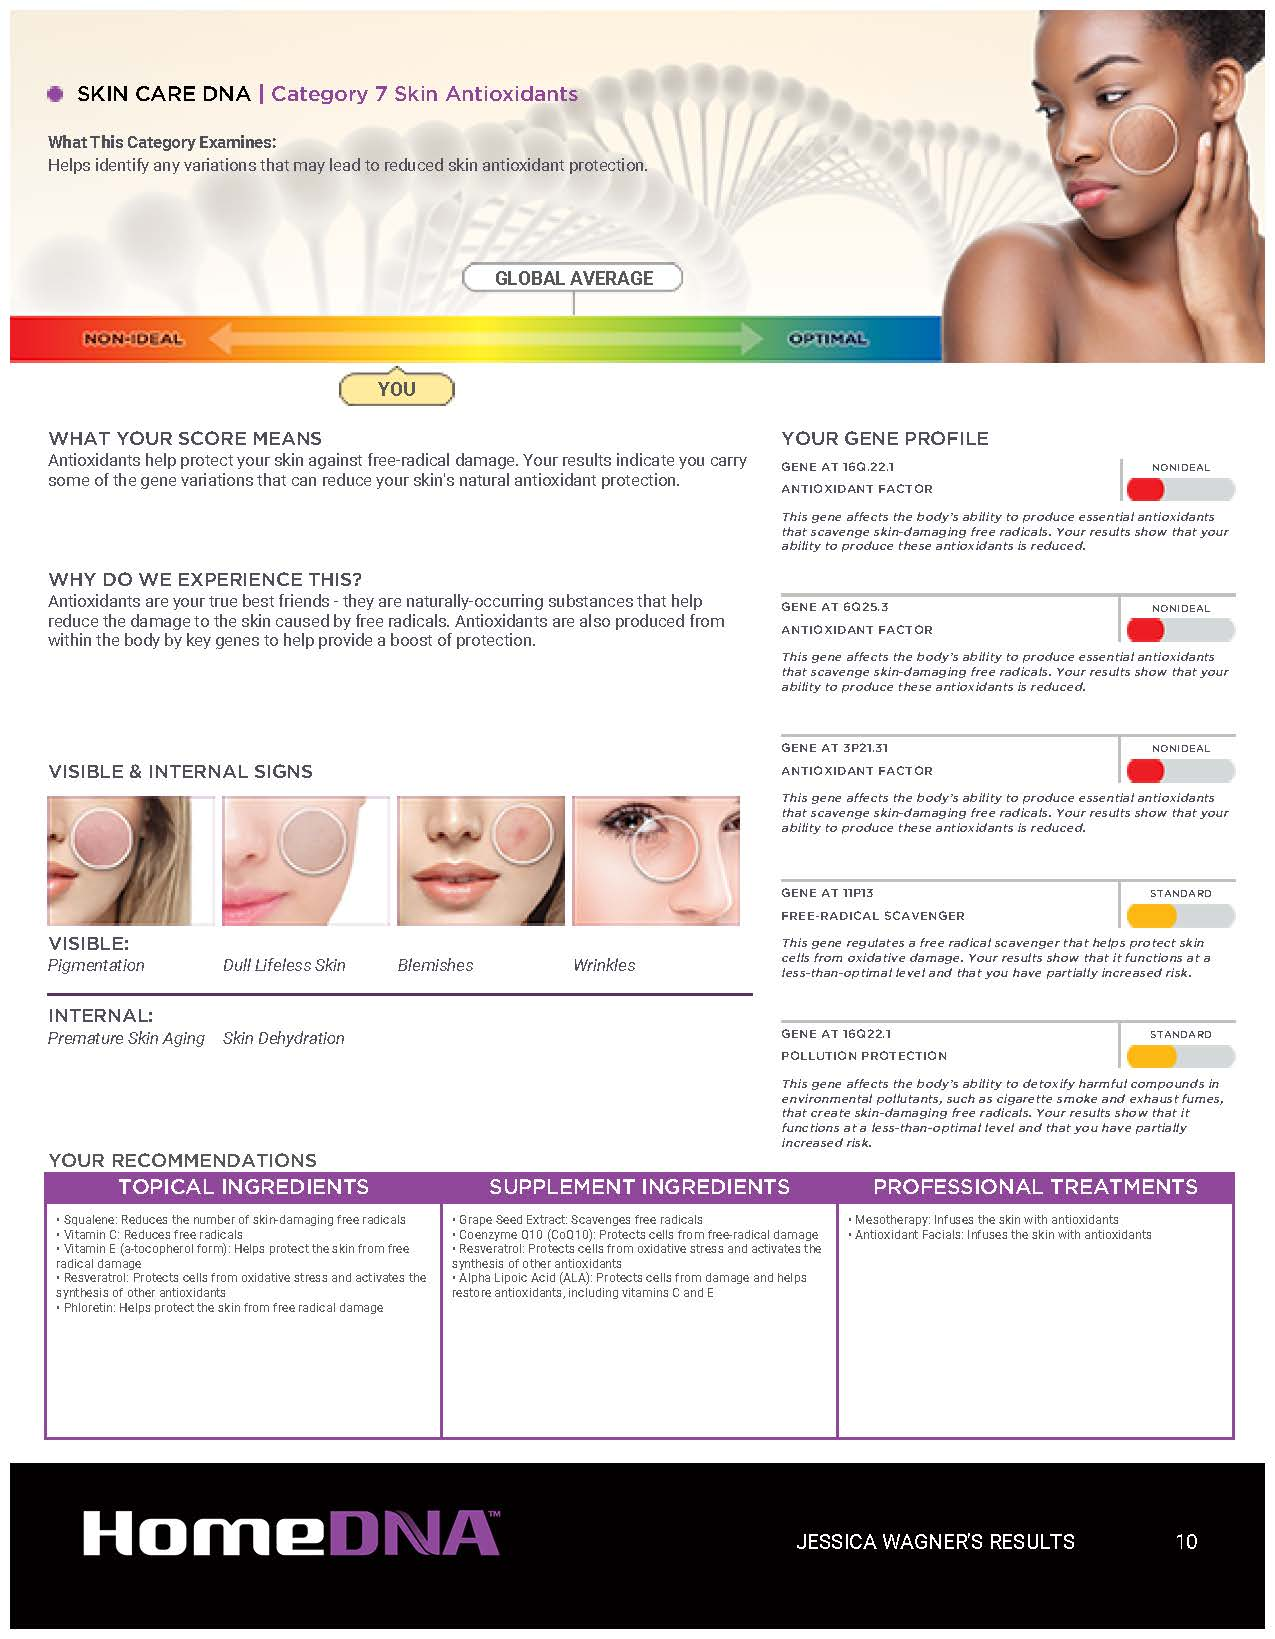 Jess_DNA_Skin_Results_Page_10.jpg